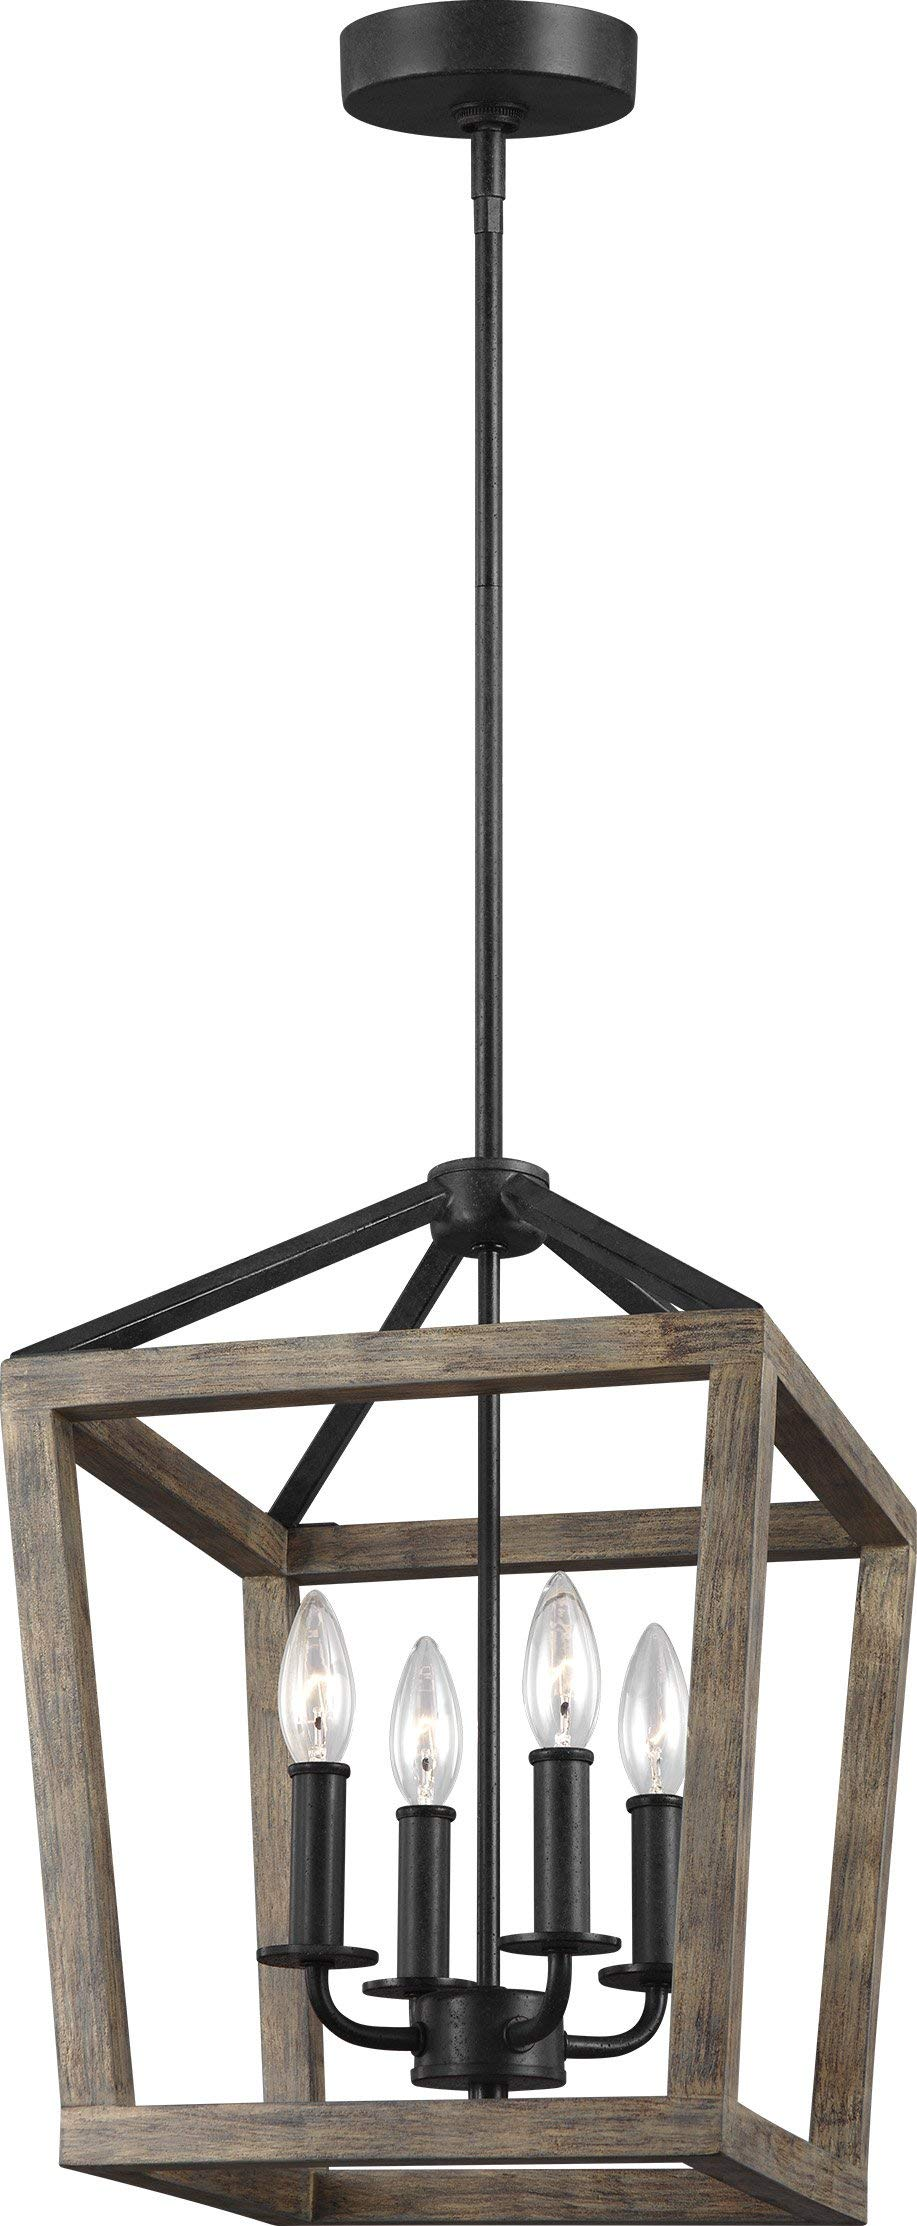 Feiss F3190/4WOW/AF Gannet Wood Lantern Pendant Lighting, Brown, 4-Light (12''W x 17''H) 240watts